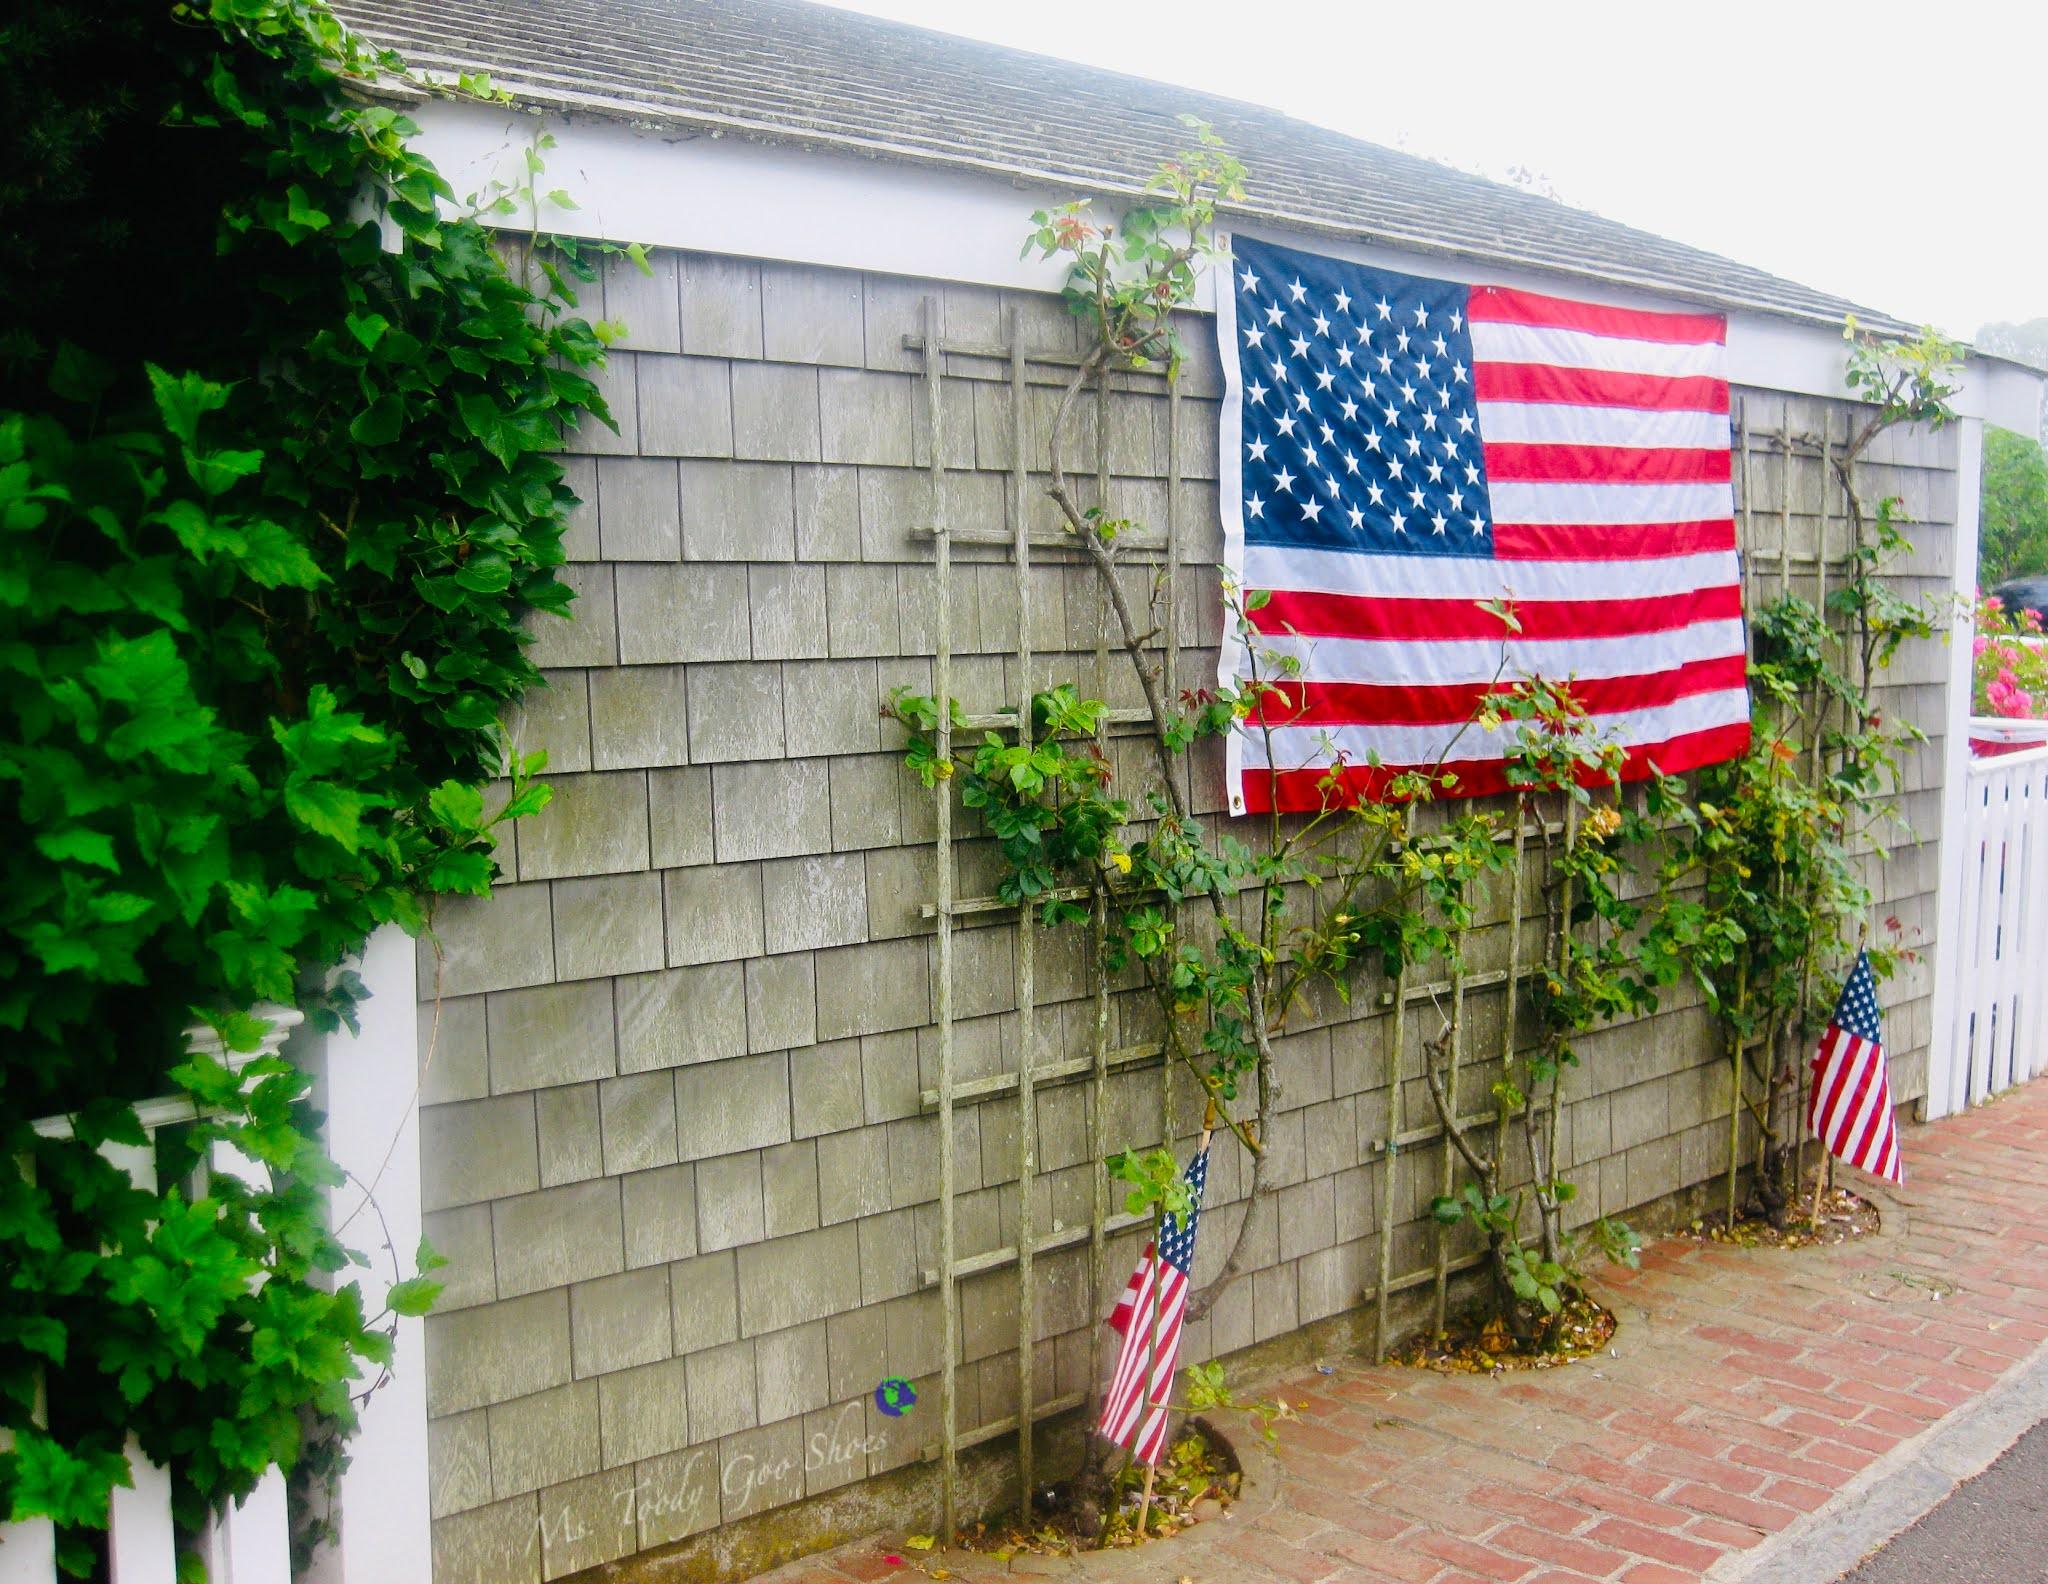 American Flags, Martha's Vineyard, MA | Ms. Toody Goo Shoes